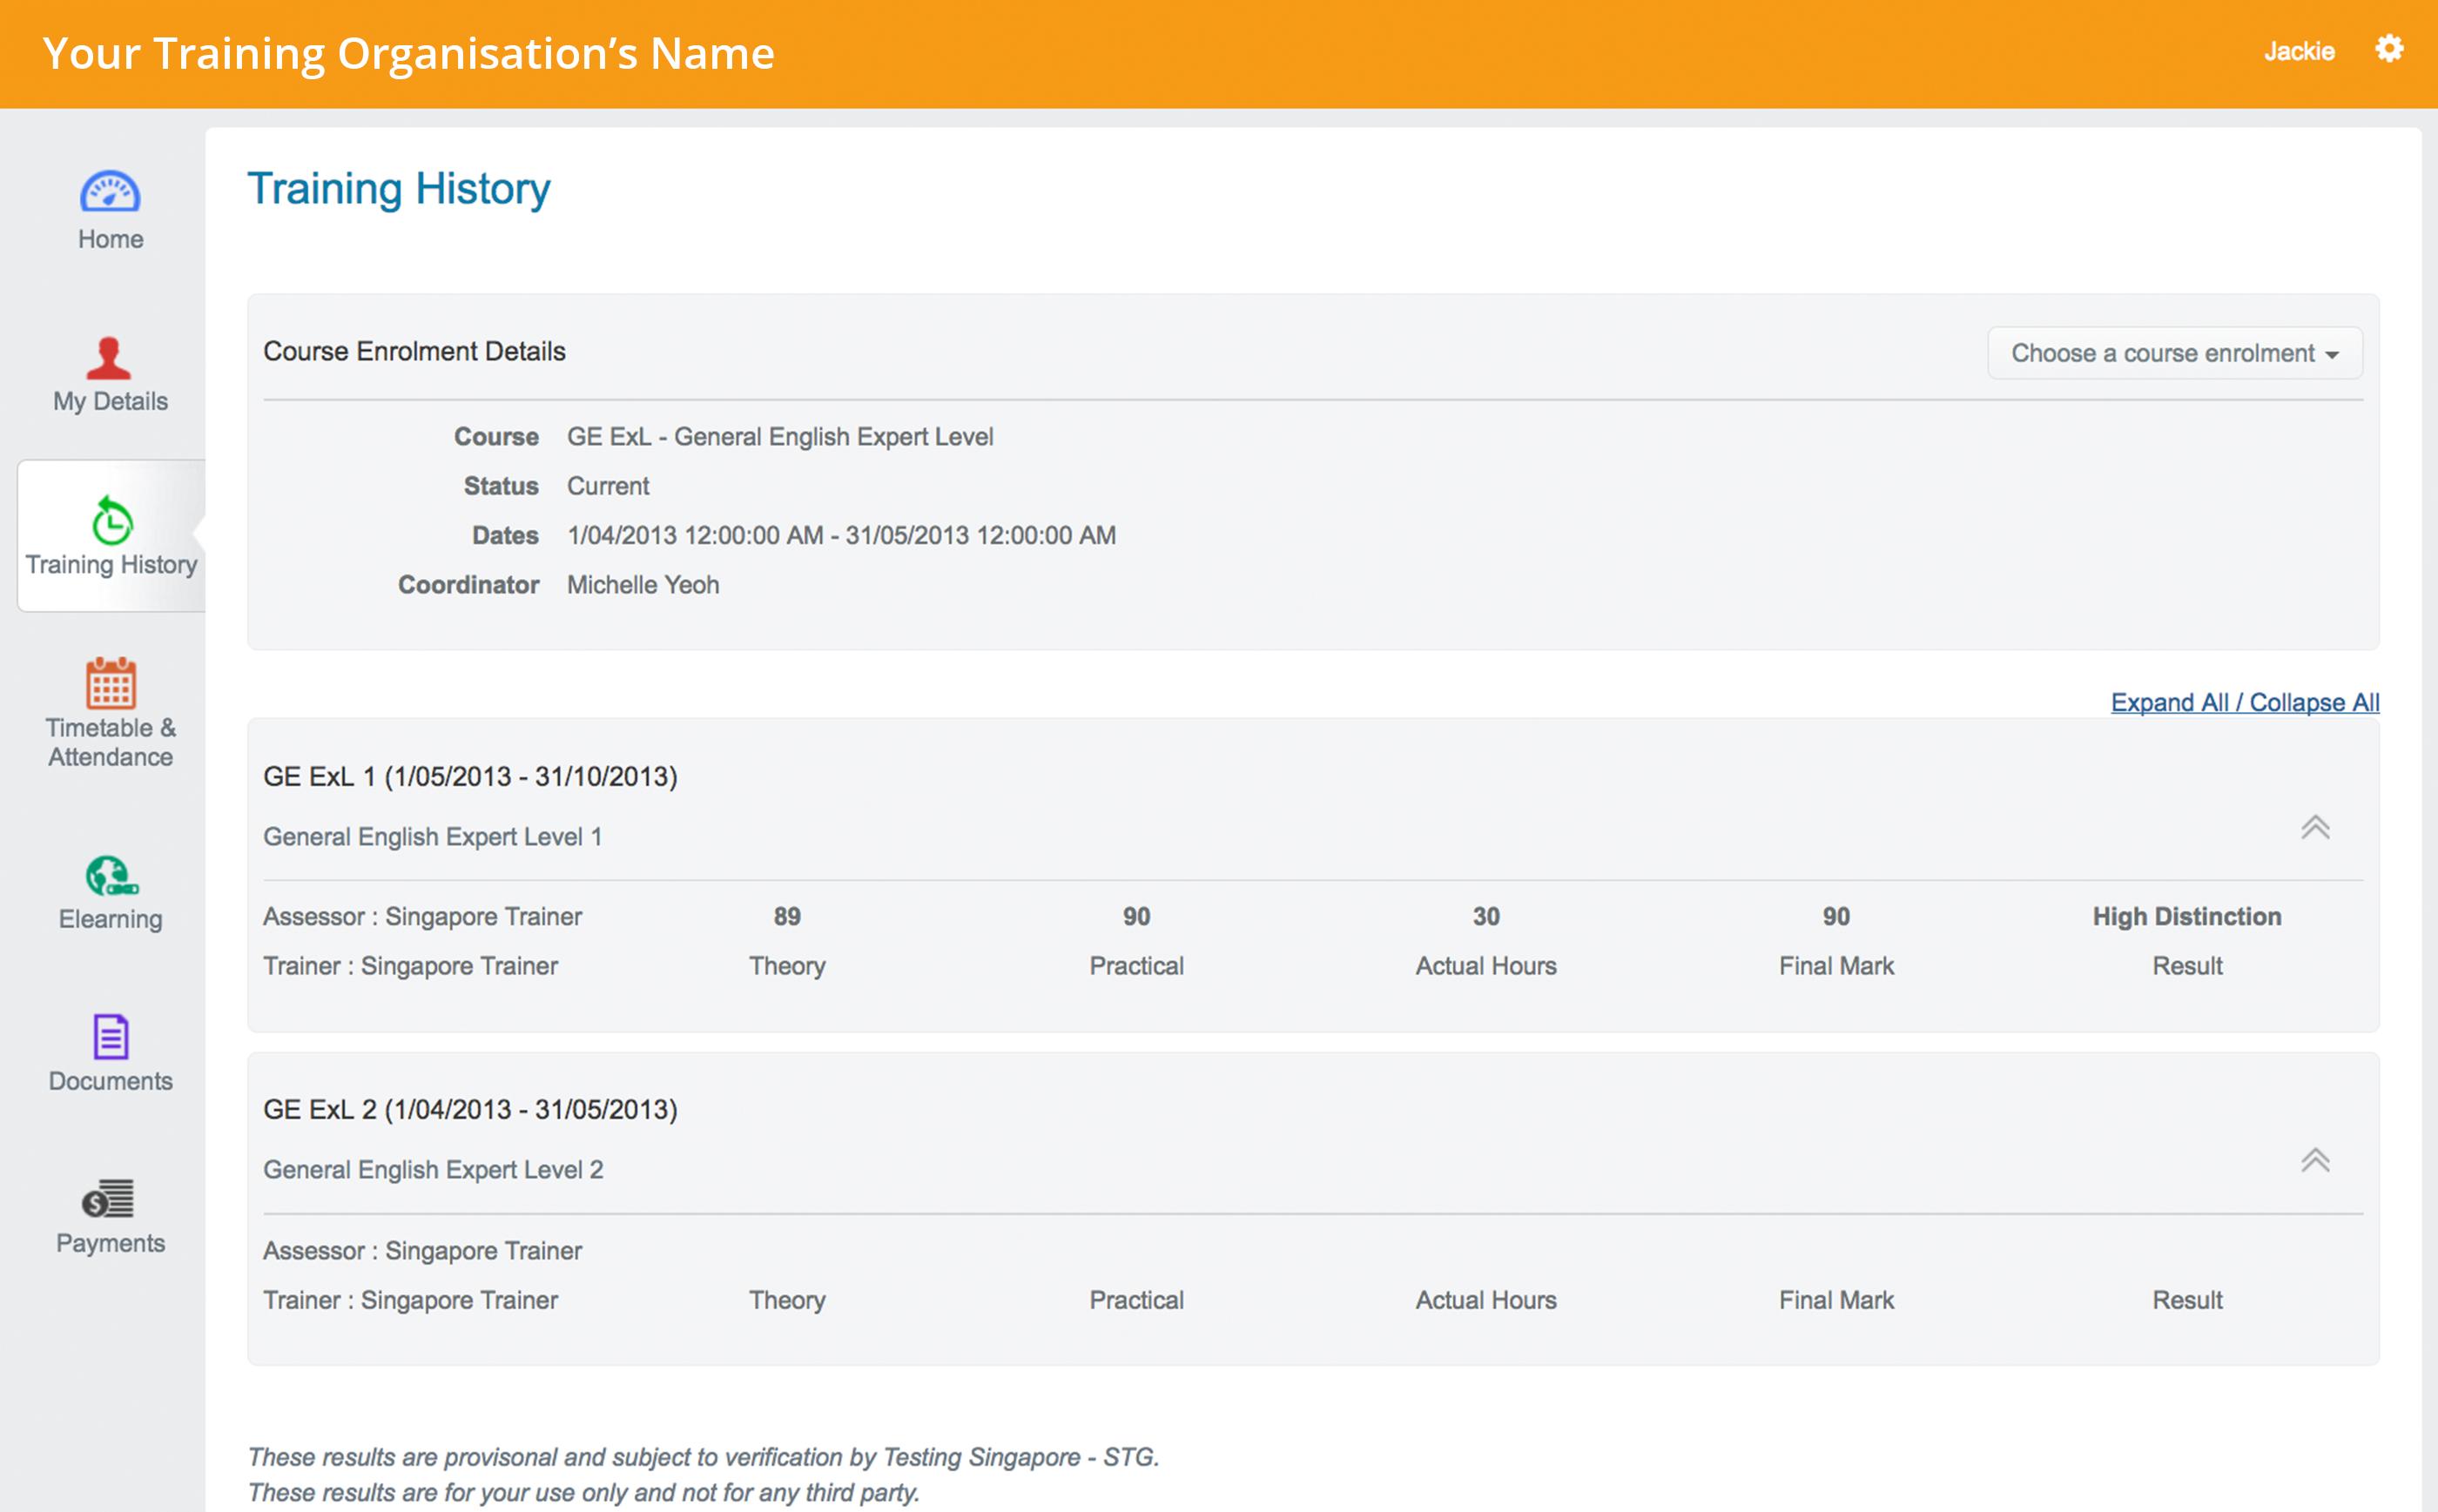 Learner-App-New-Orange_Training-History-Grades.png